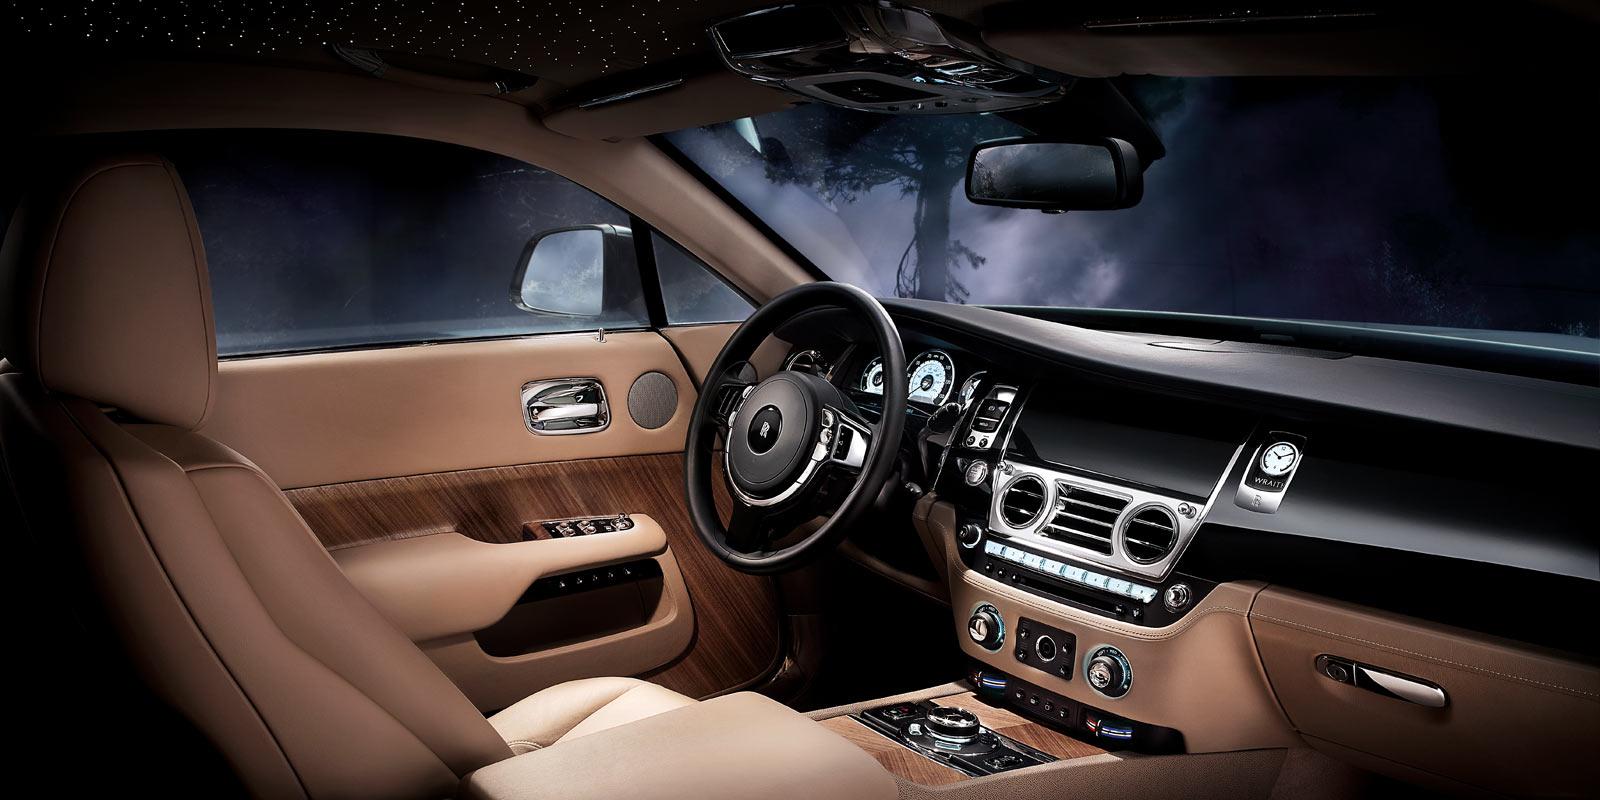 Rolls-Royce Wraith Interior Photo